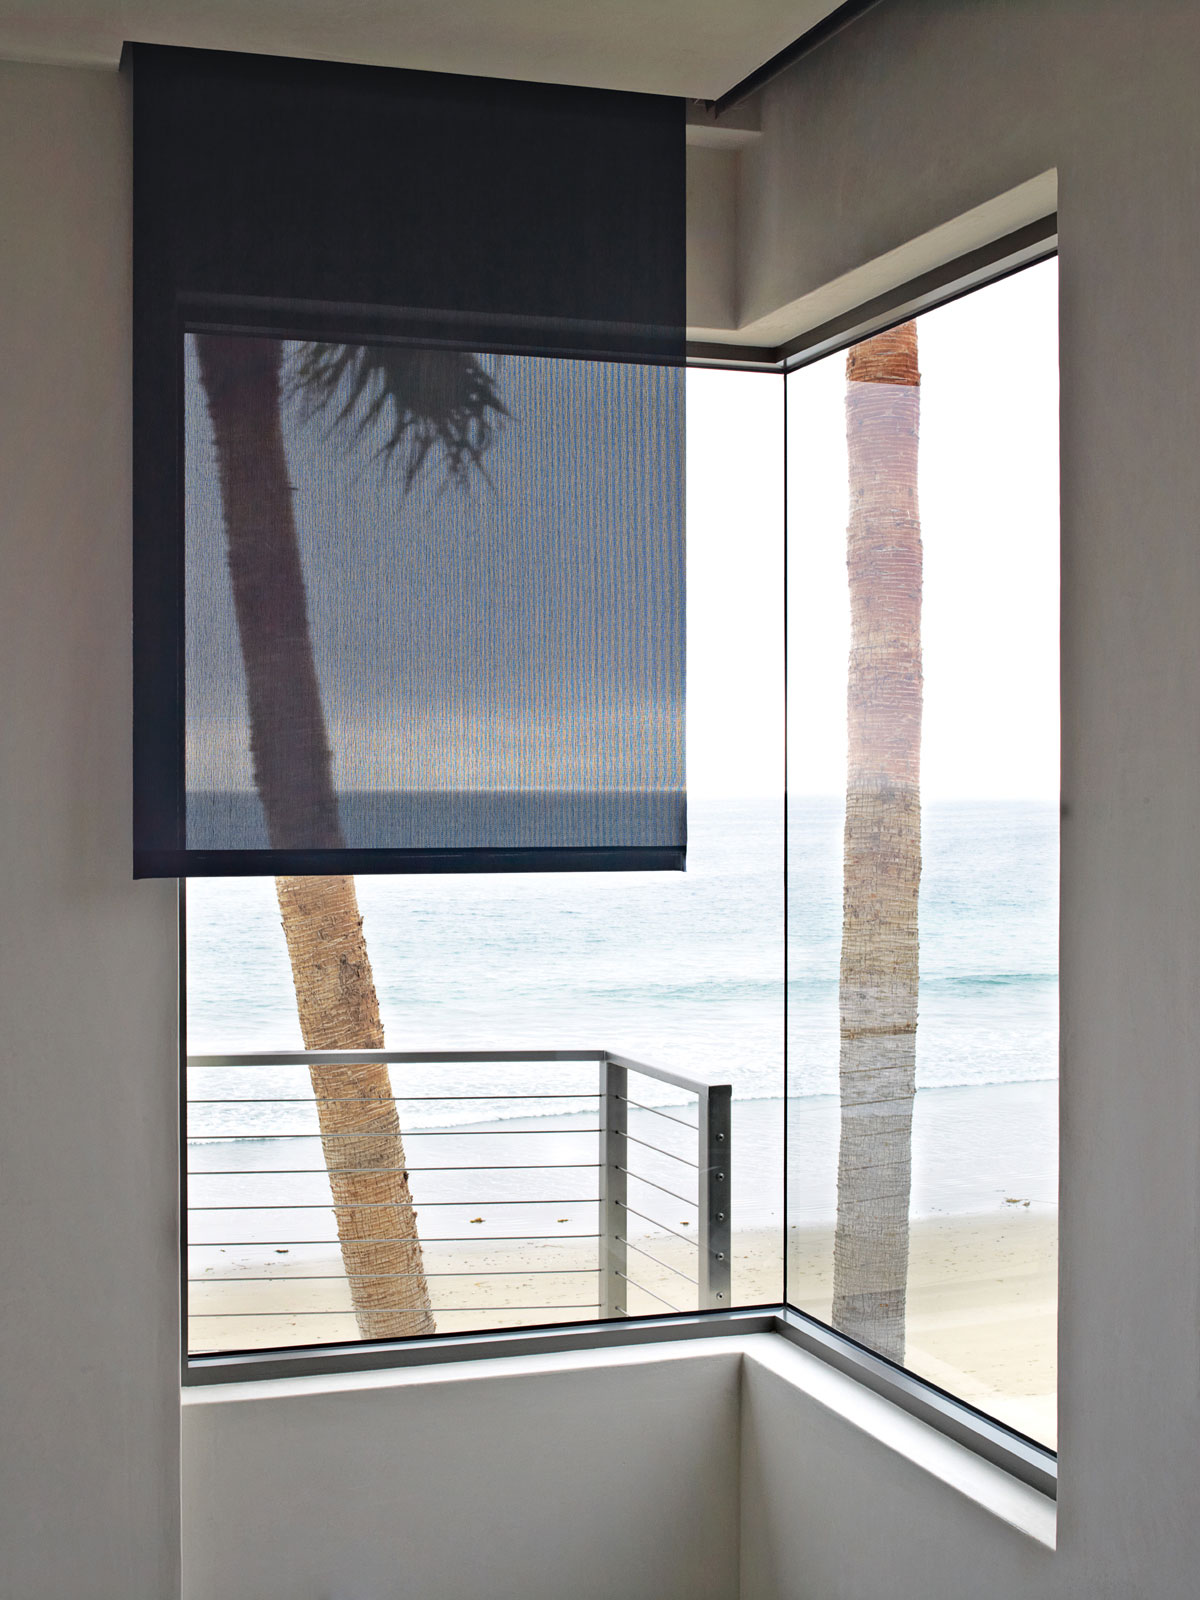 Large Window, Eco-Friendly Beach House in California